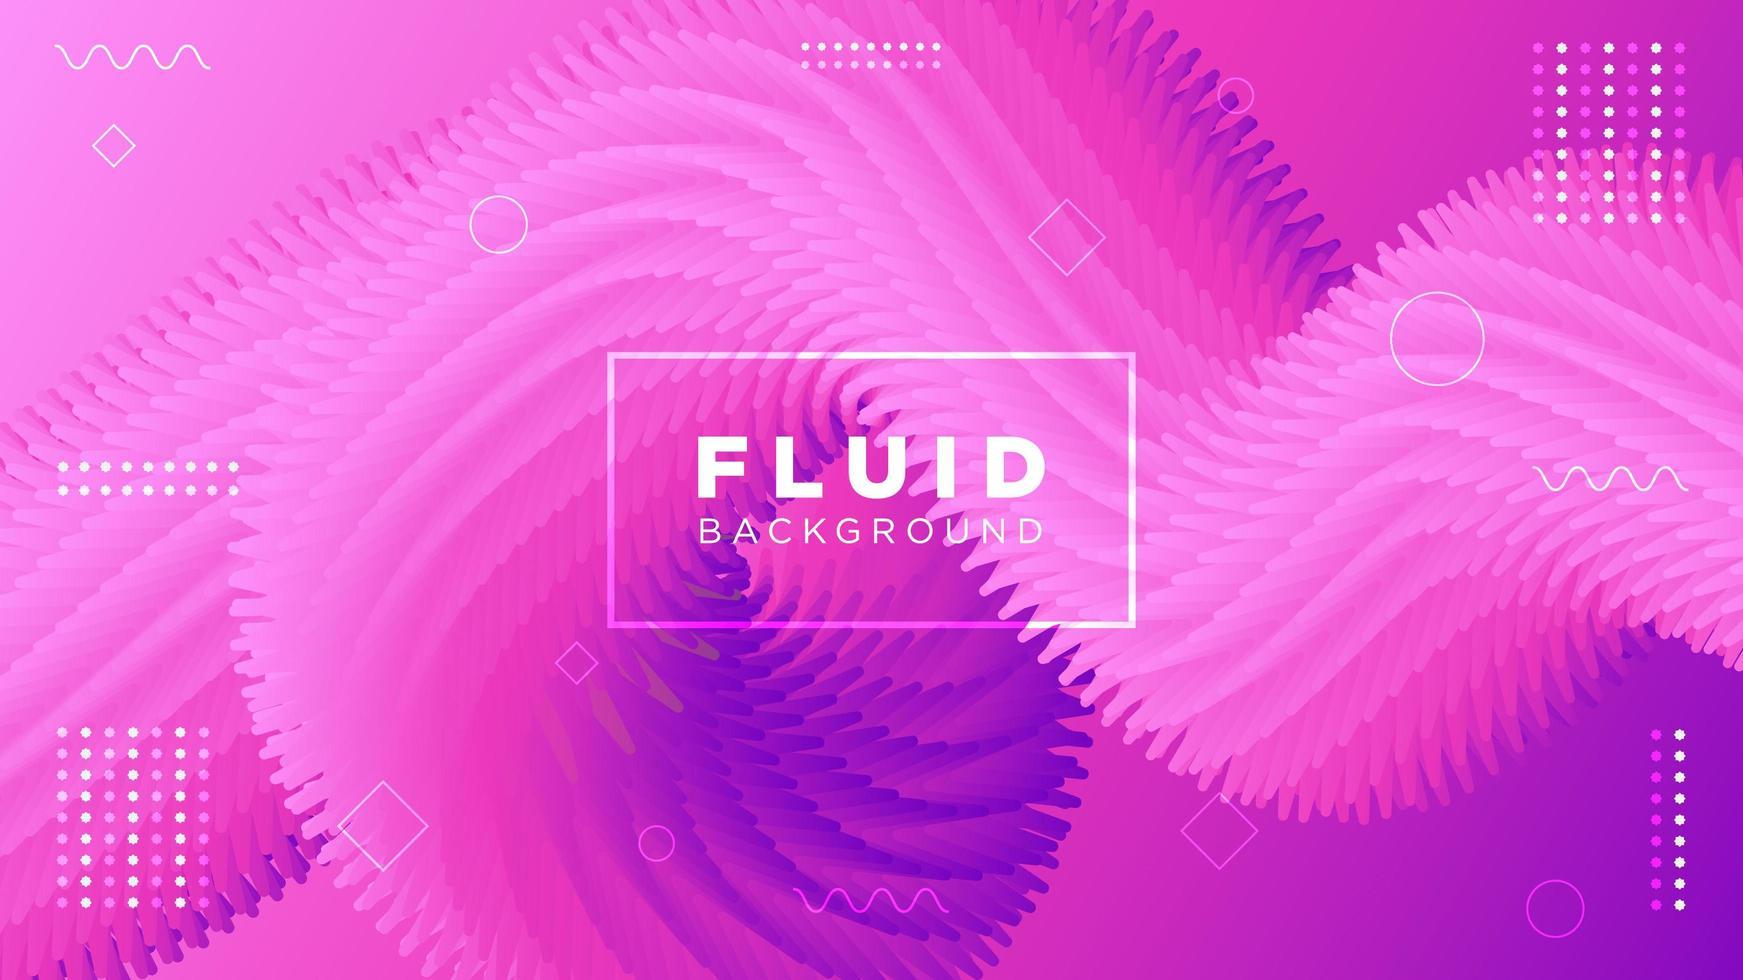 Movimiento moderno spikey fondo rosa fluido vector